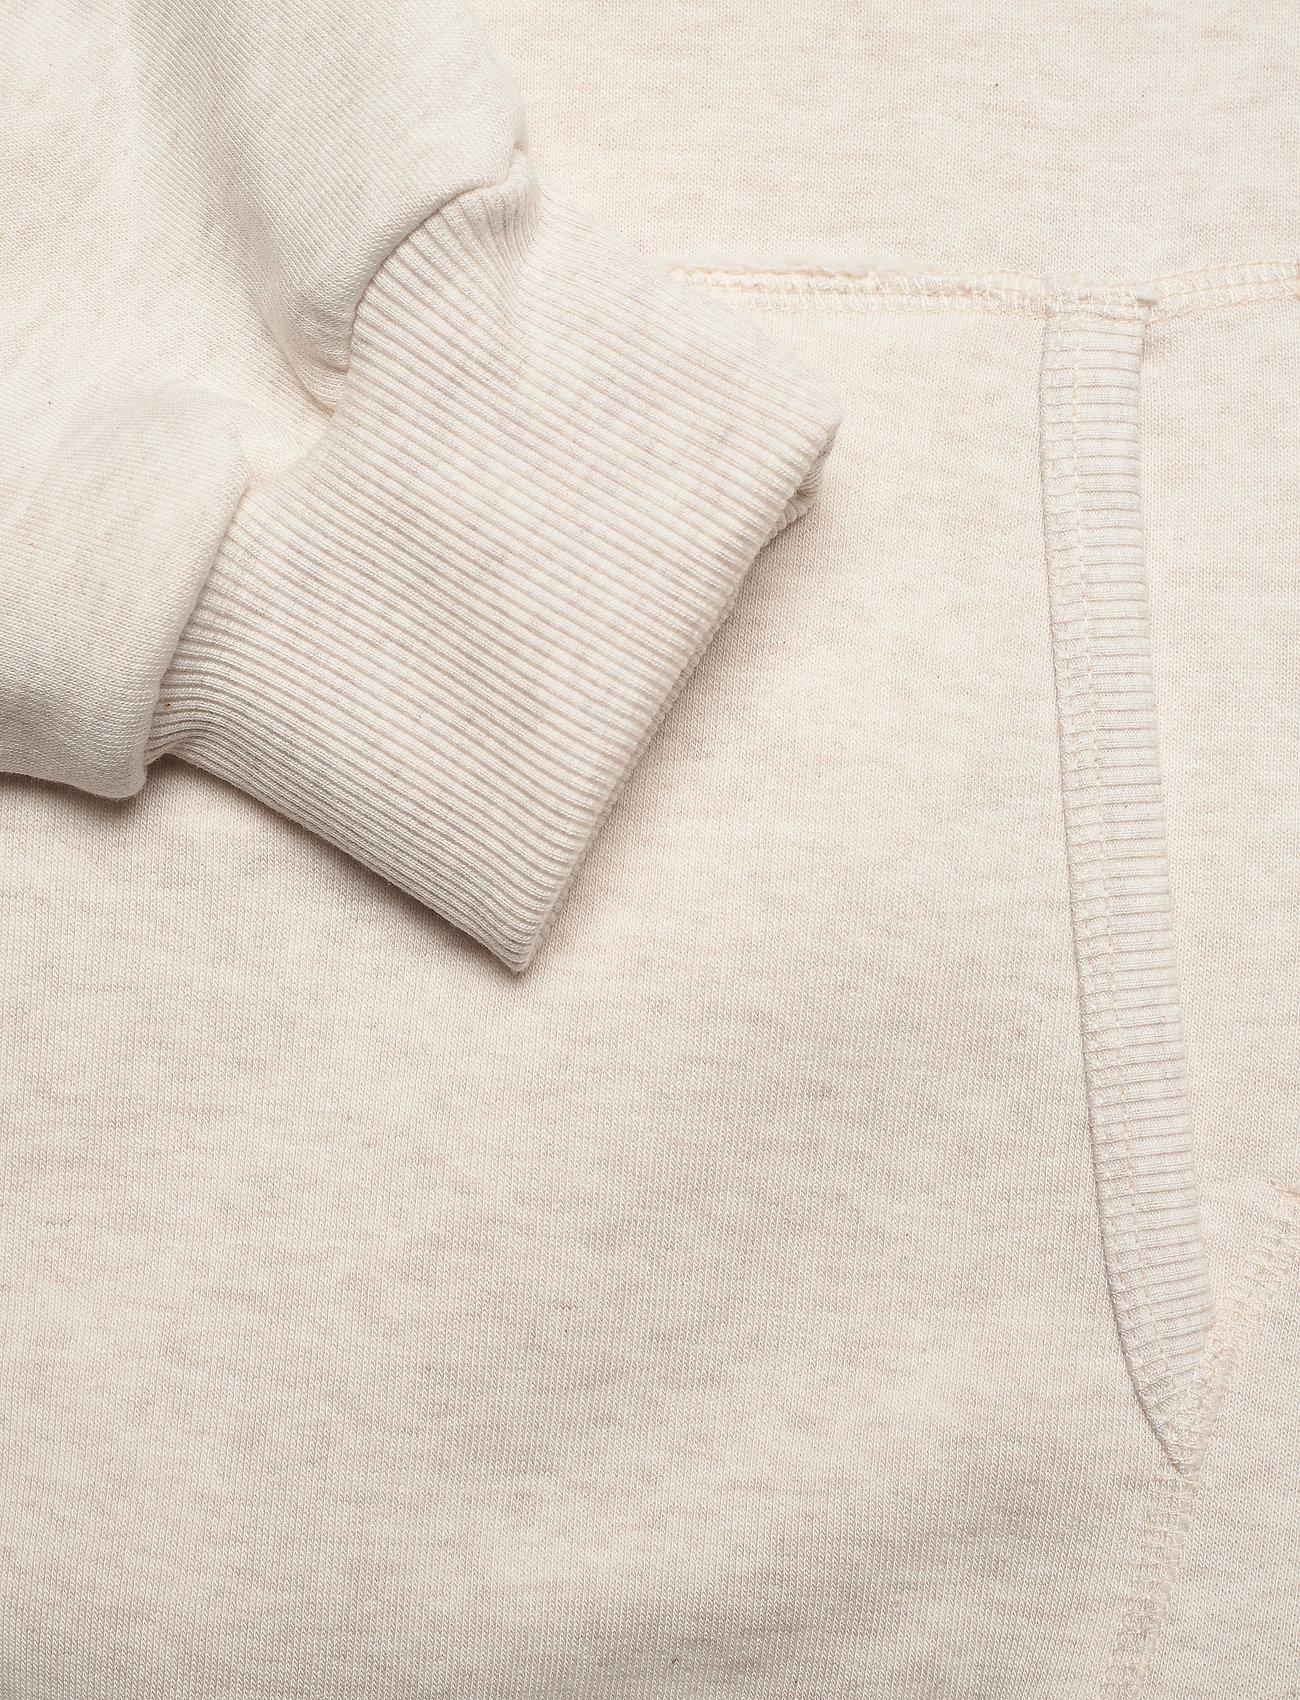 RODEBJER - RODEBJER MONOGRAM - sweatshirts & hættetrøjer - puffy white - 3